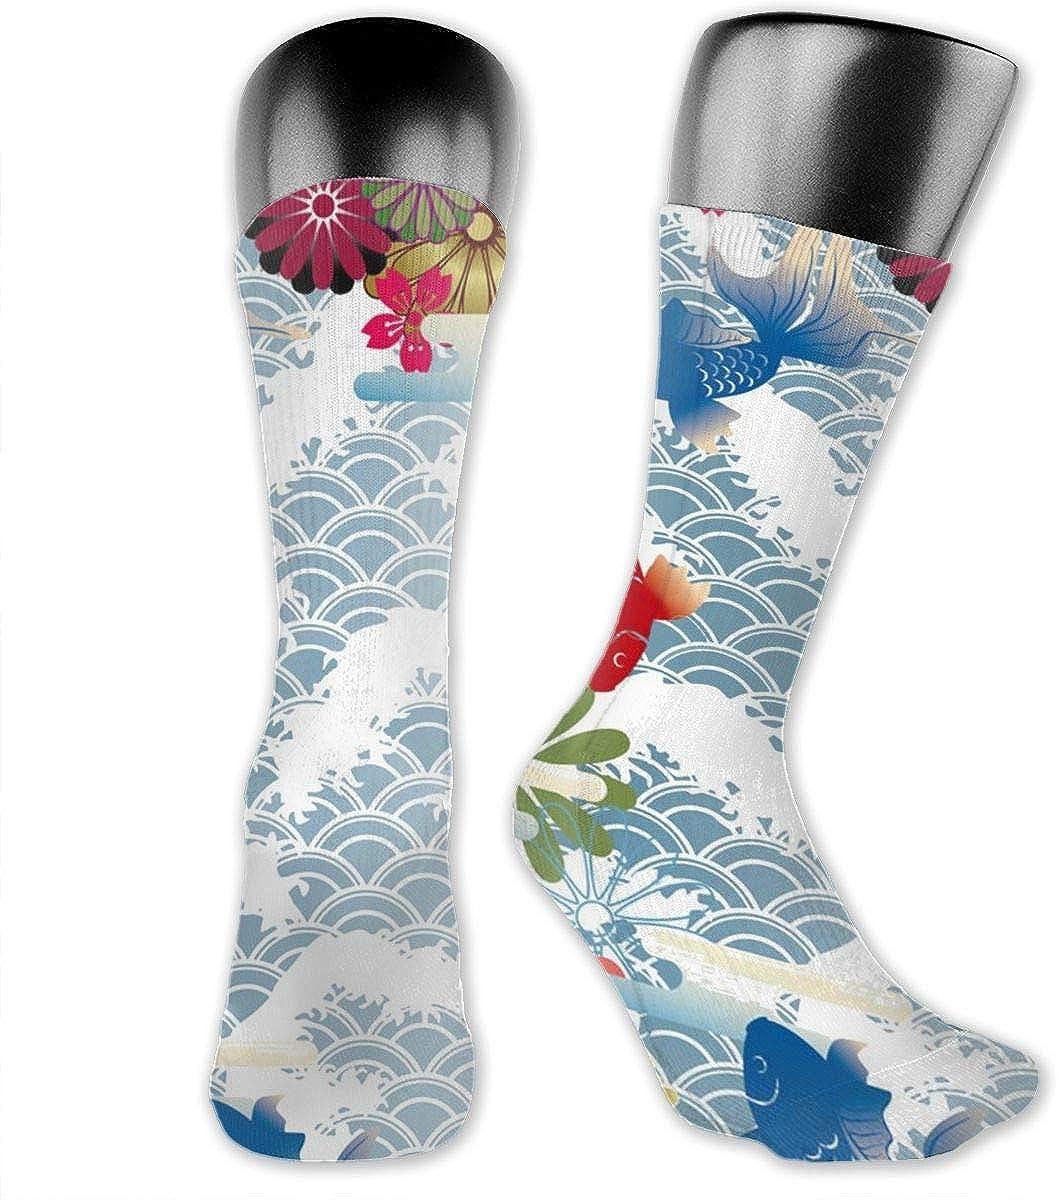 Koi FishFashion Athletic Socks Knee High Socks For Men/&Women All Sport Holiday